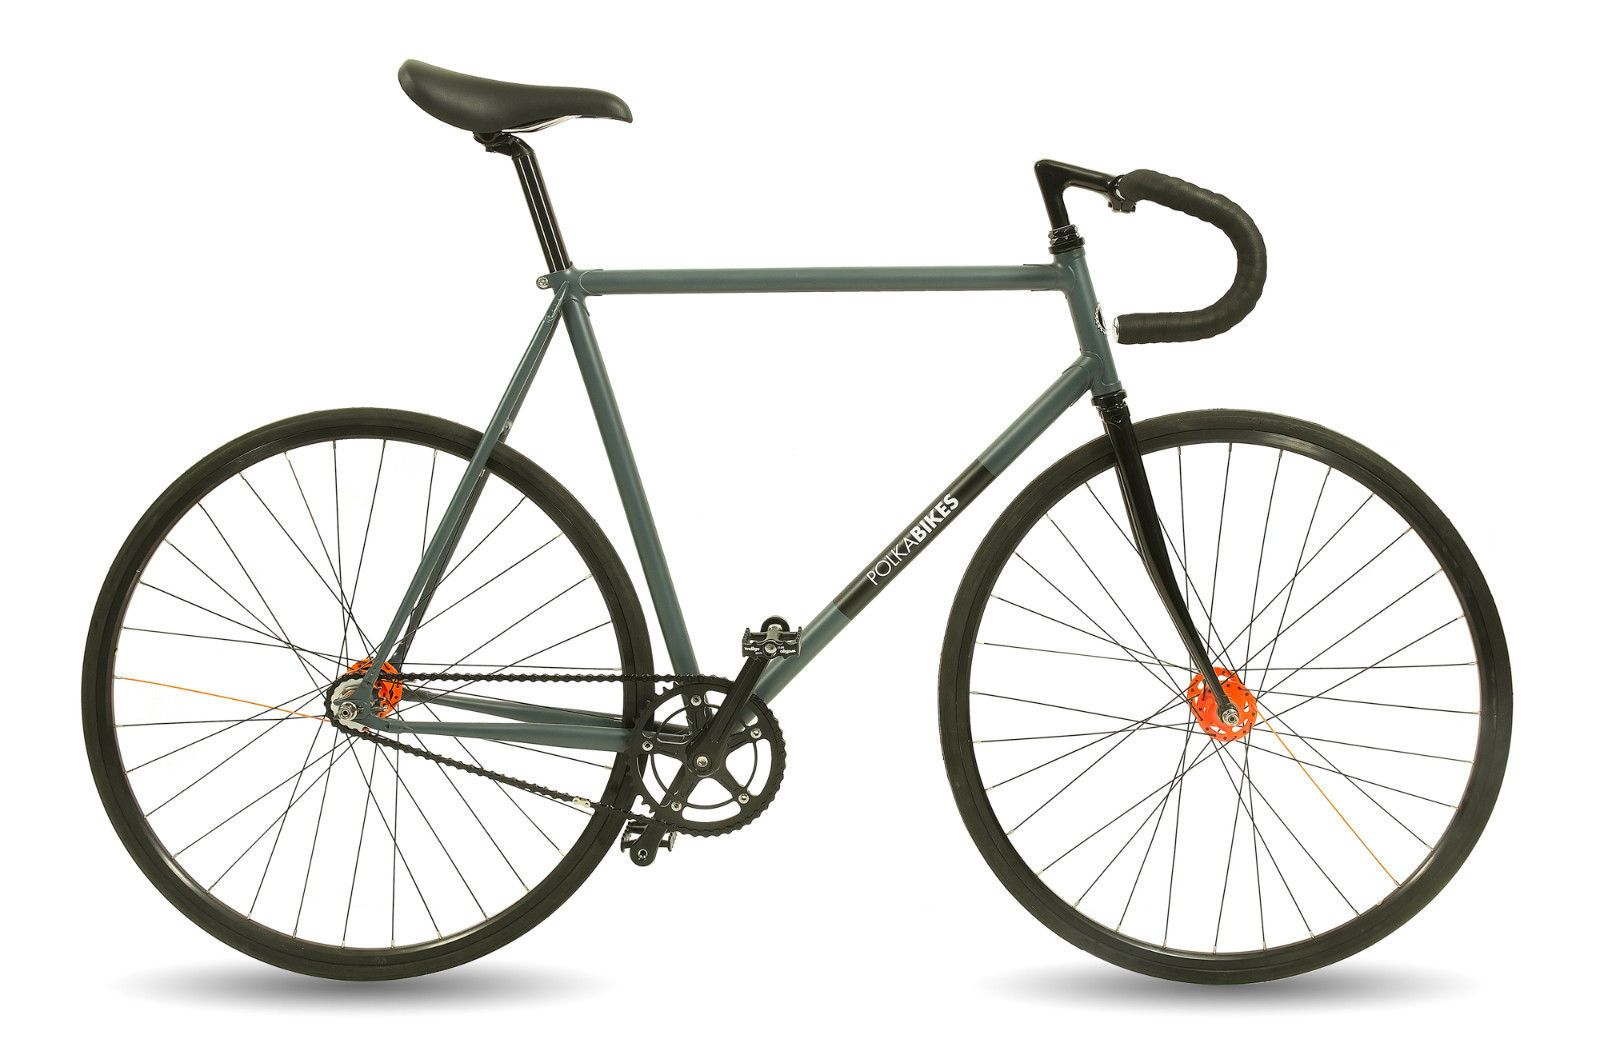 Polka Bikes Tornado 58 cm Lugged Frame High Quality Urban Single ...